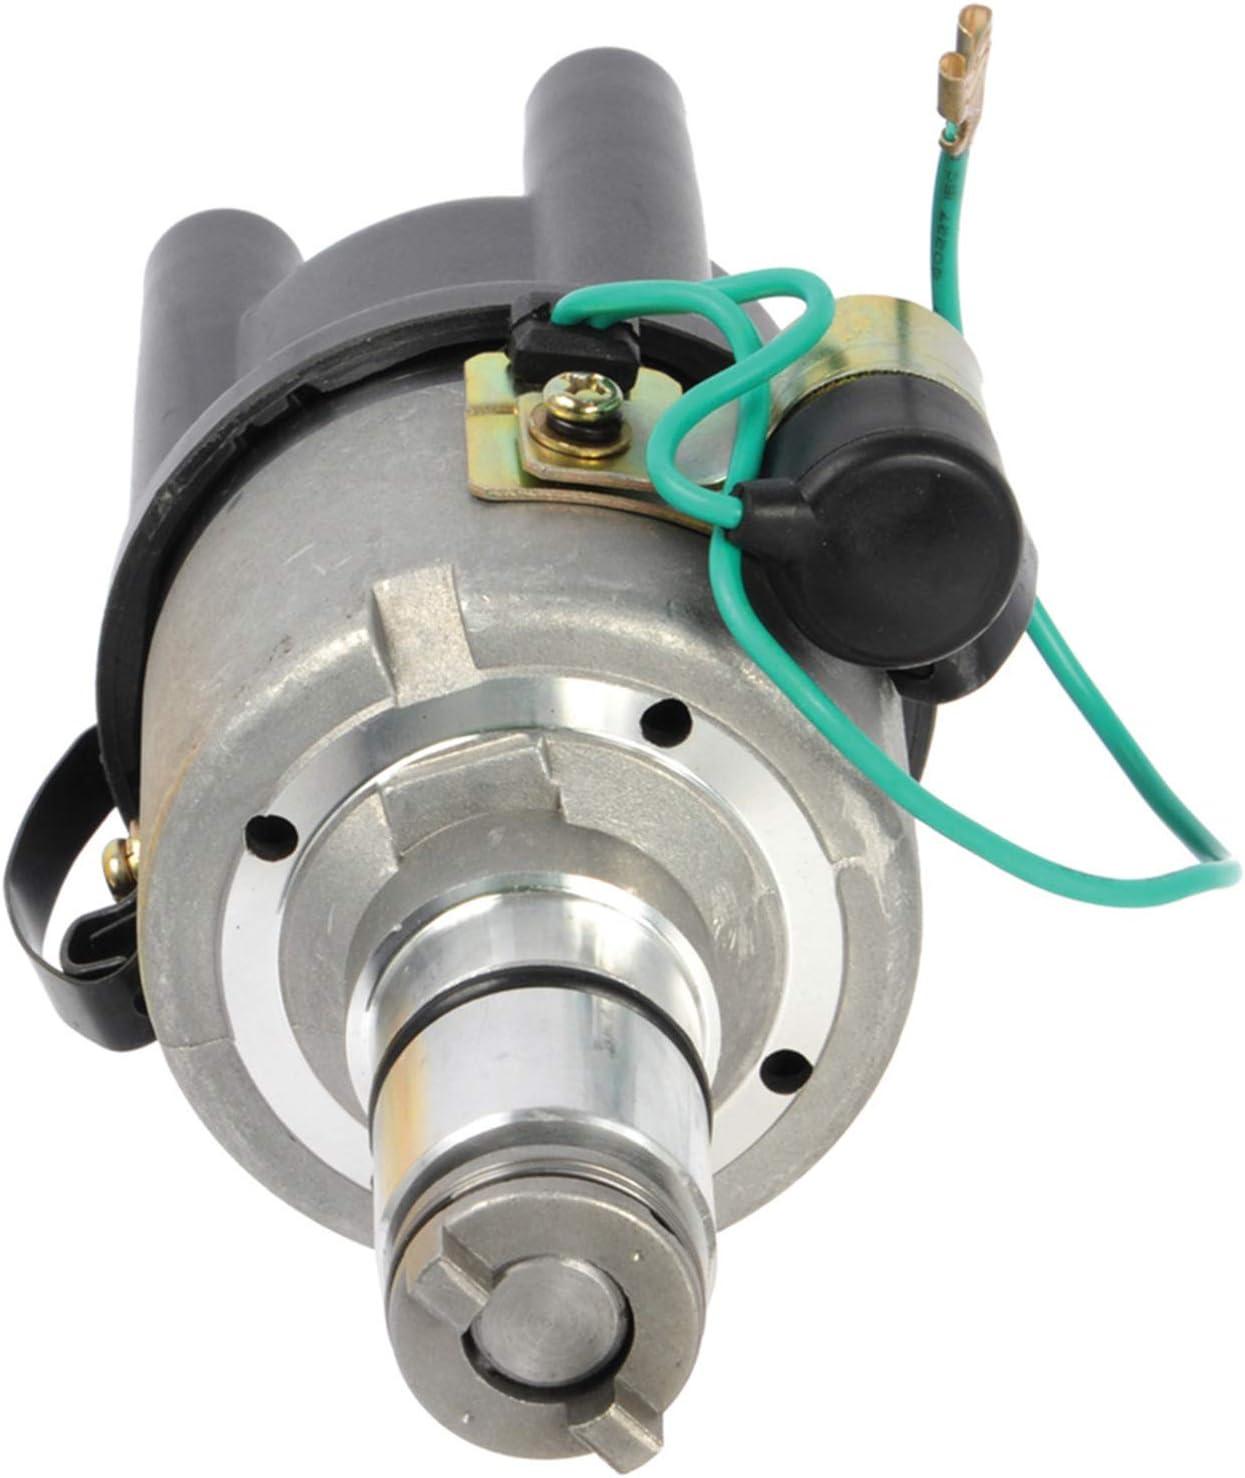 Cardone 84-946 New HEI Electronic Distributor and Module